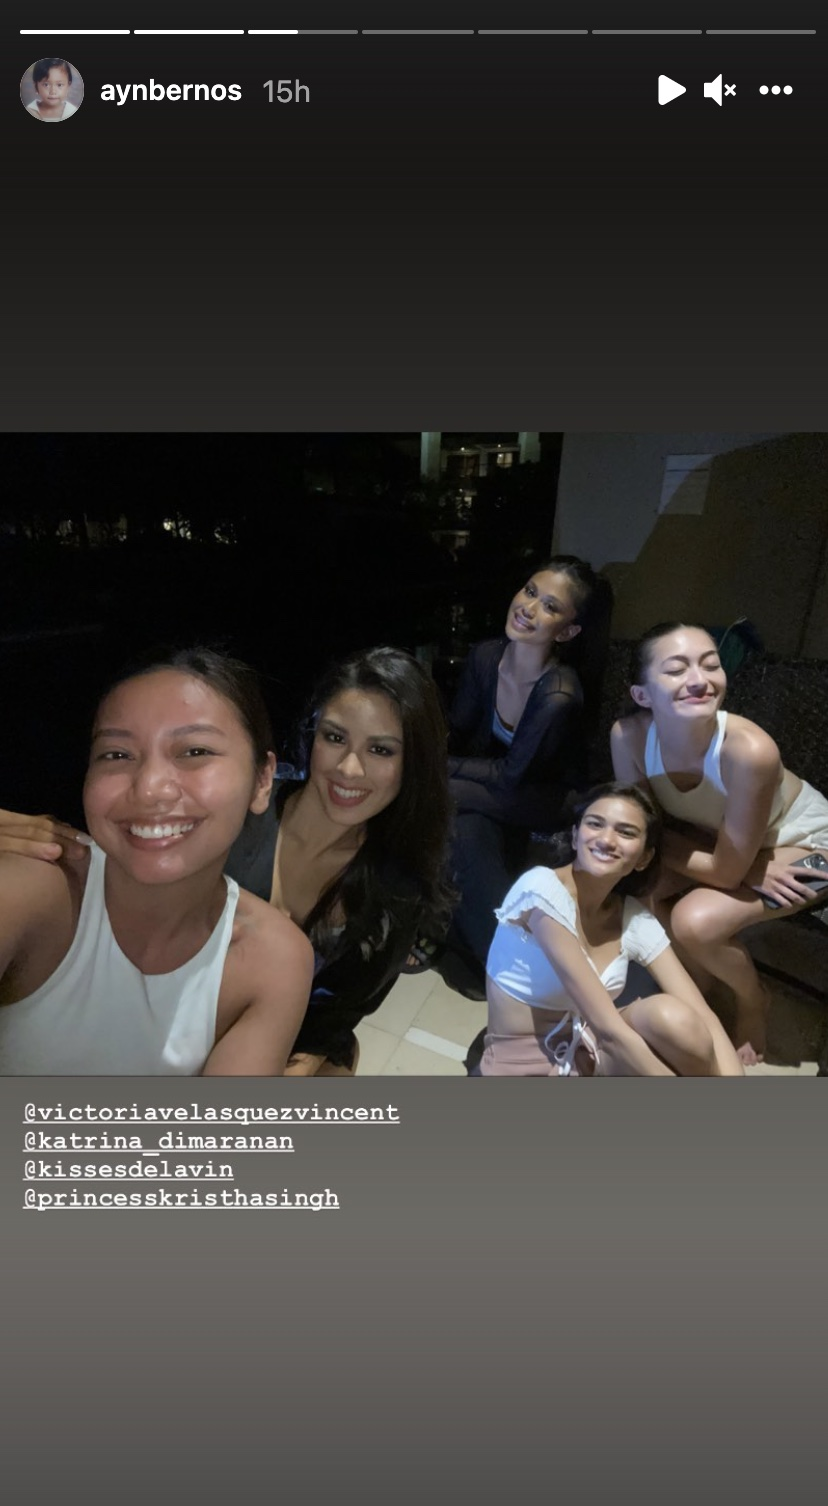 Ayn Bernos with fellow Miss Universe Philippines 2021 contestants Kisses Delavin, Katrina Dimaranan, Princess Kristha Singh, and Victoria Velasquez Vincent